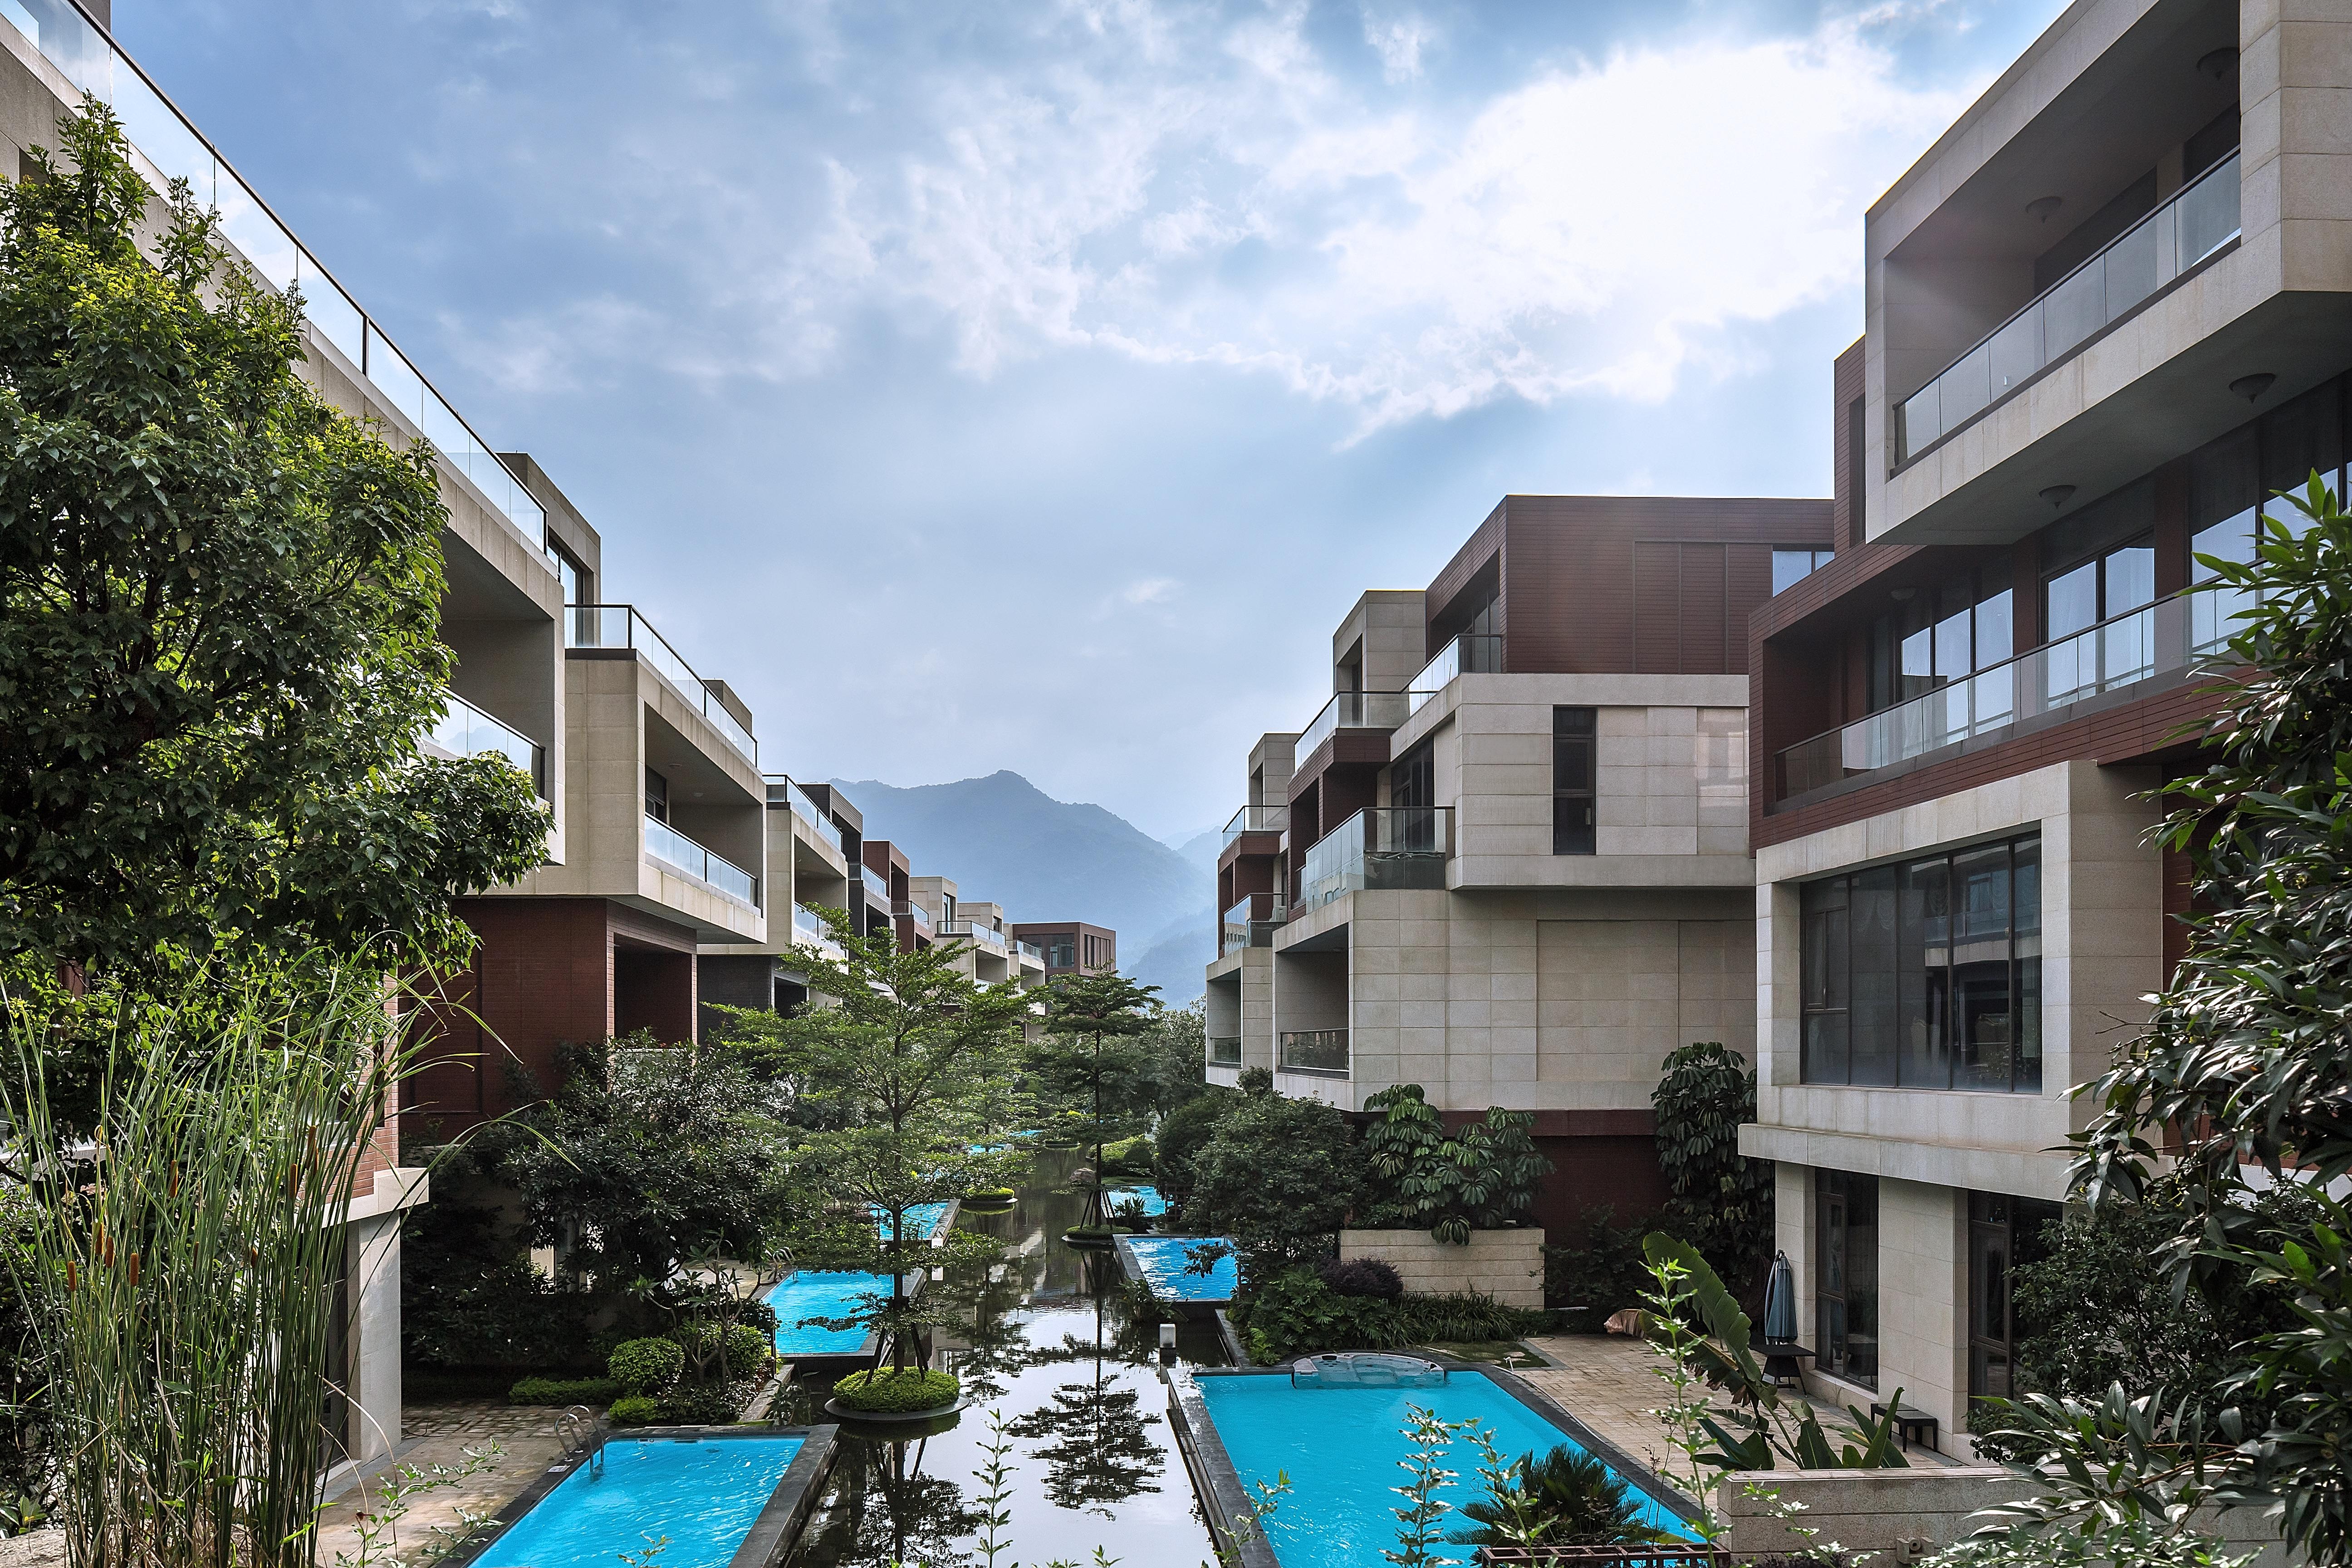 <p>Lianjiang – Butterfly Bay, woningbouw project in Fujian Provincie met maximale integratie tussen natuur en wonen</p>